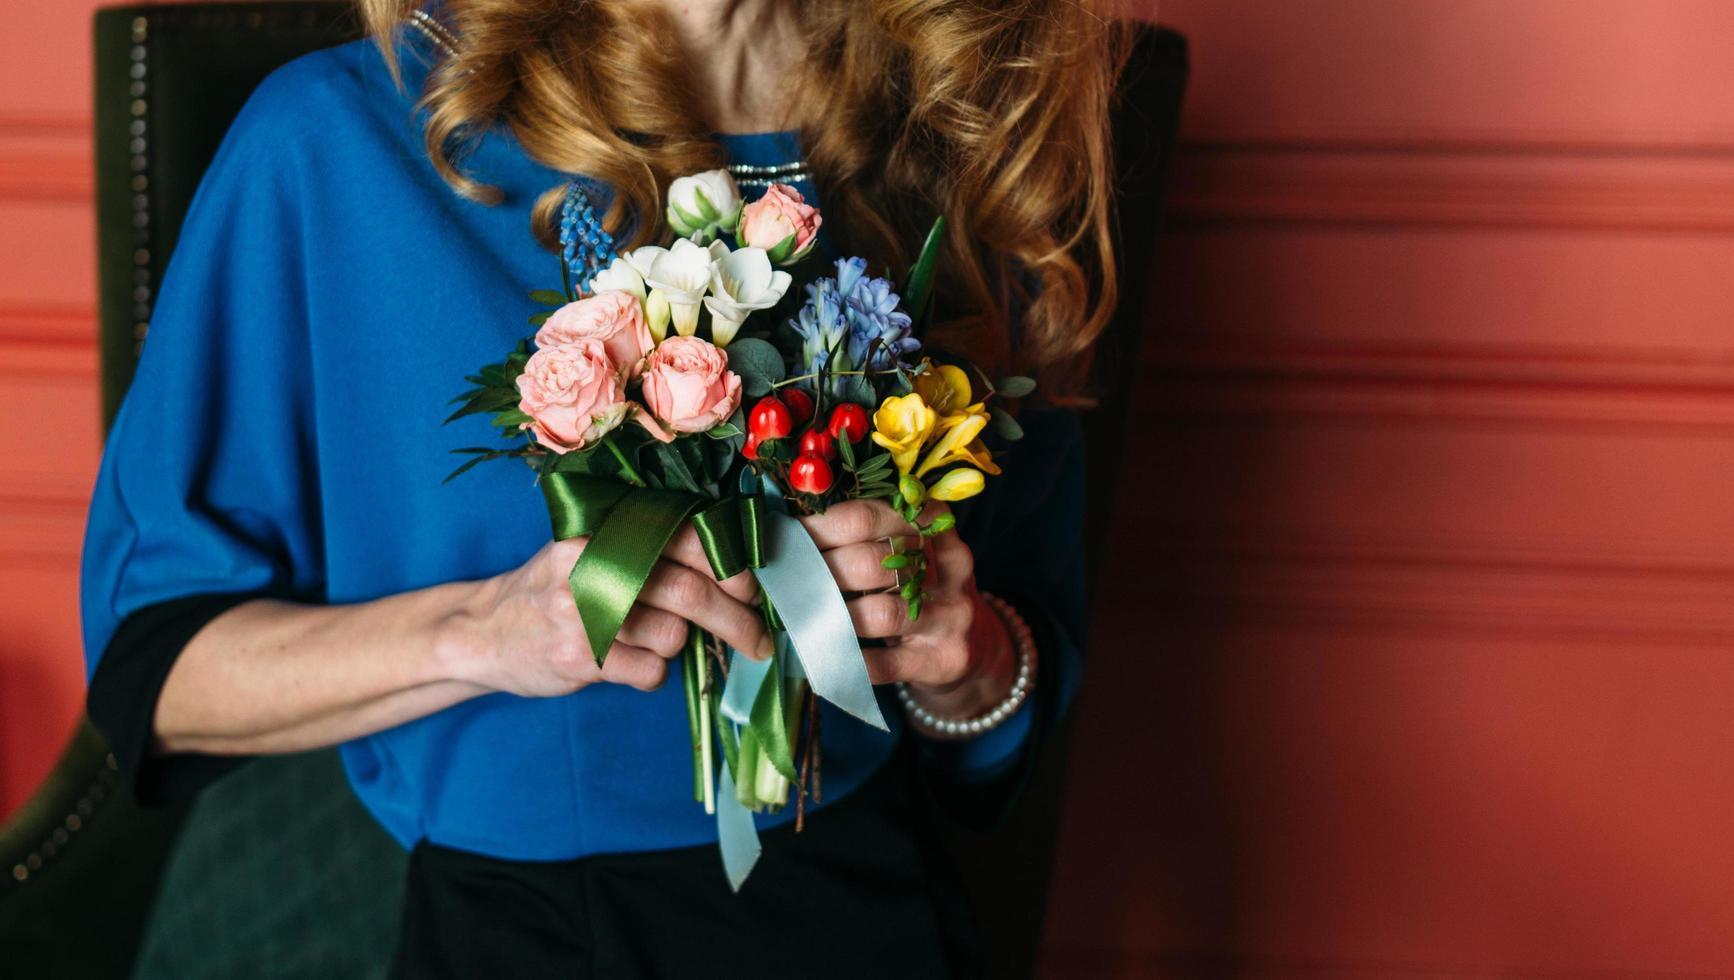 Woman holding a bouquet photo